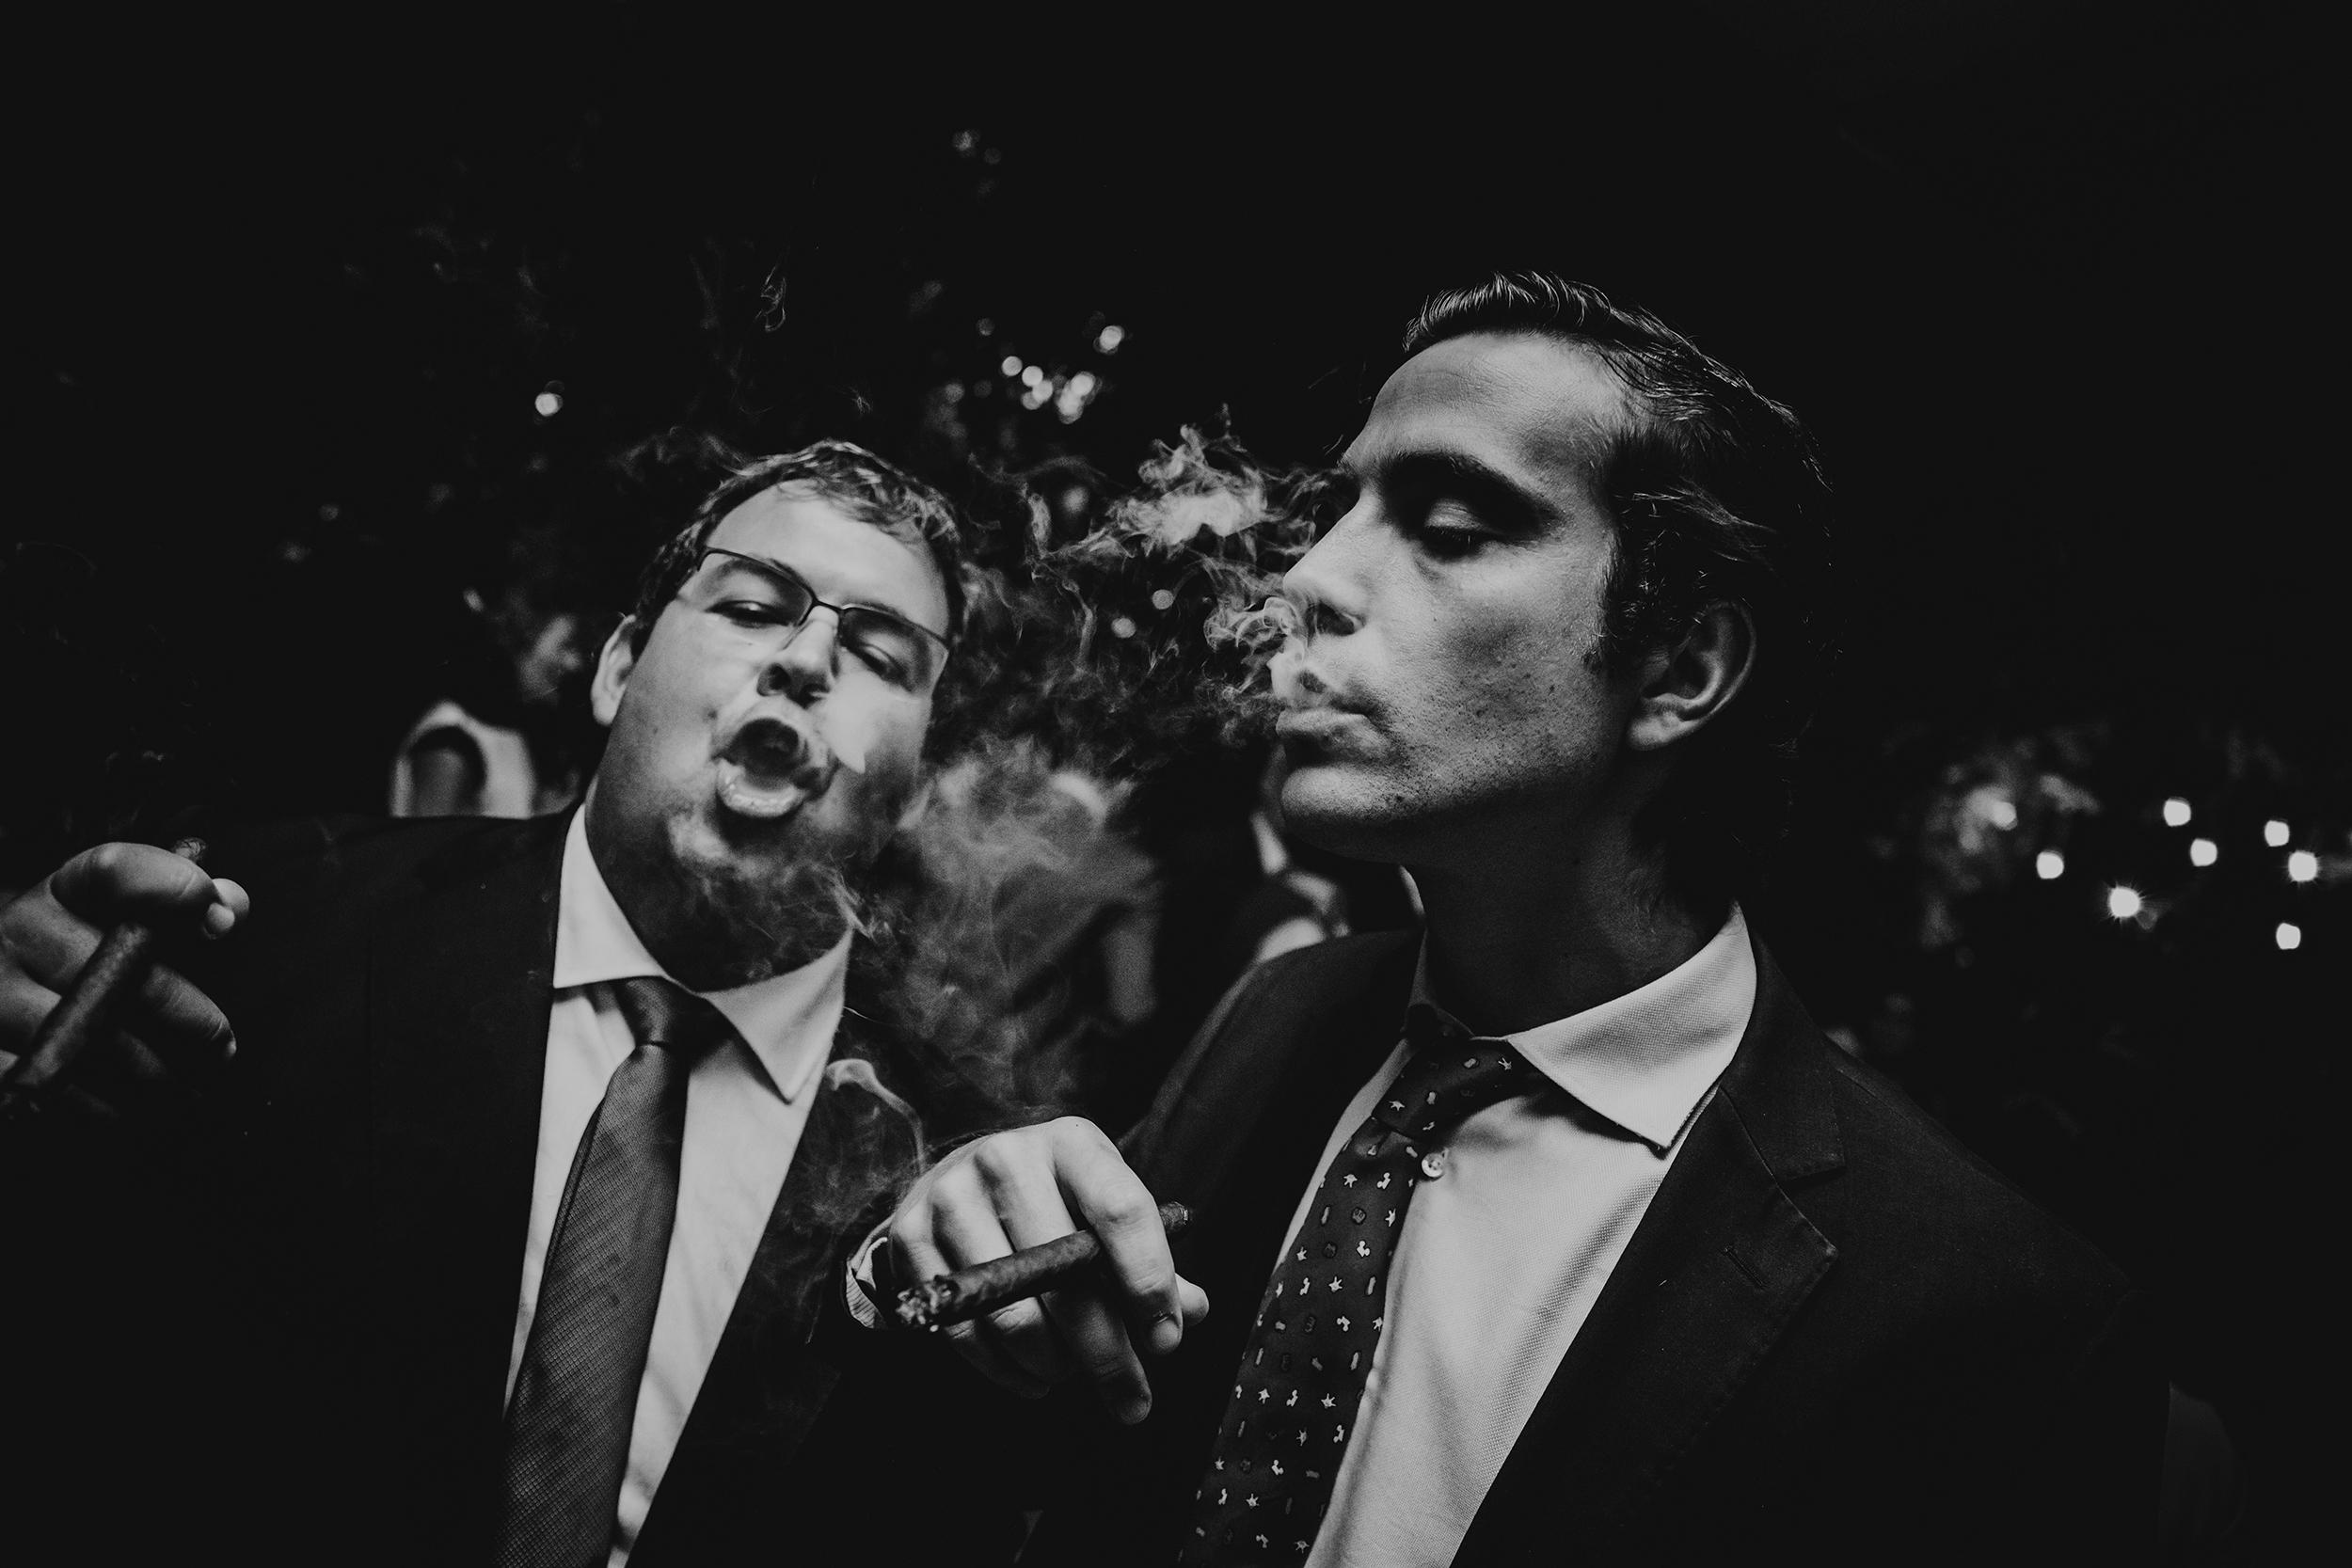 fotografo-bodas-granada-catedral-sagrario-jose-reyes_087.jpg